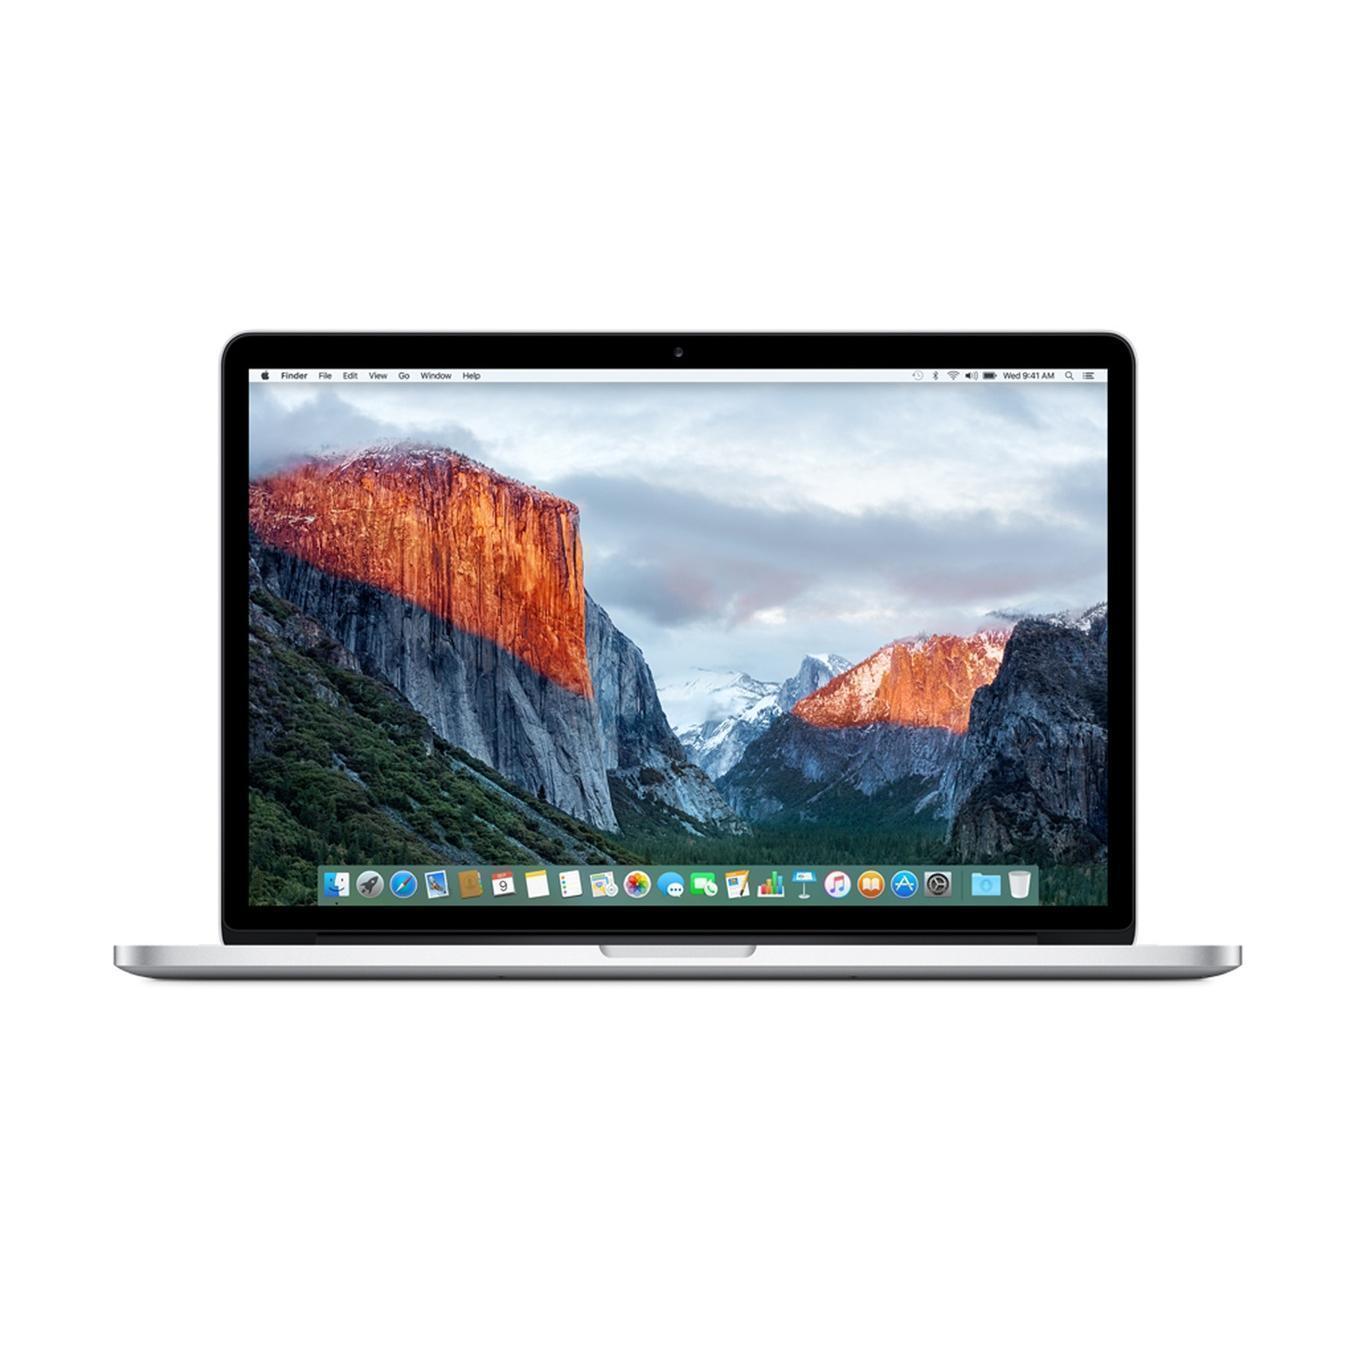 MacBook Pro Retina 15,4-tum (2015) - Core i7 - 16GB - SSD 500 GB AZERTY - Fransk